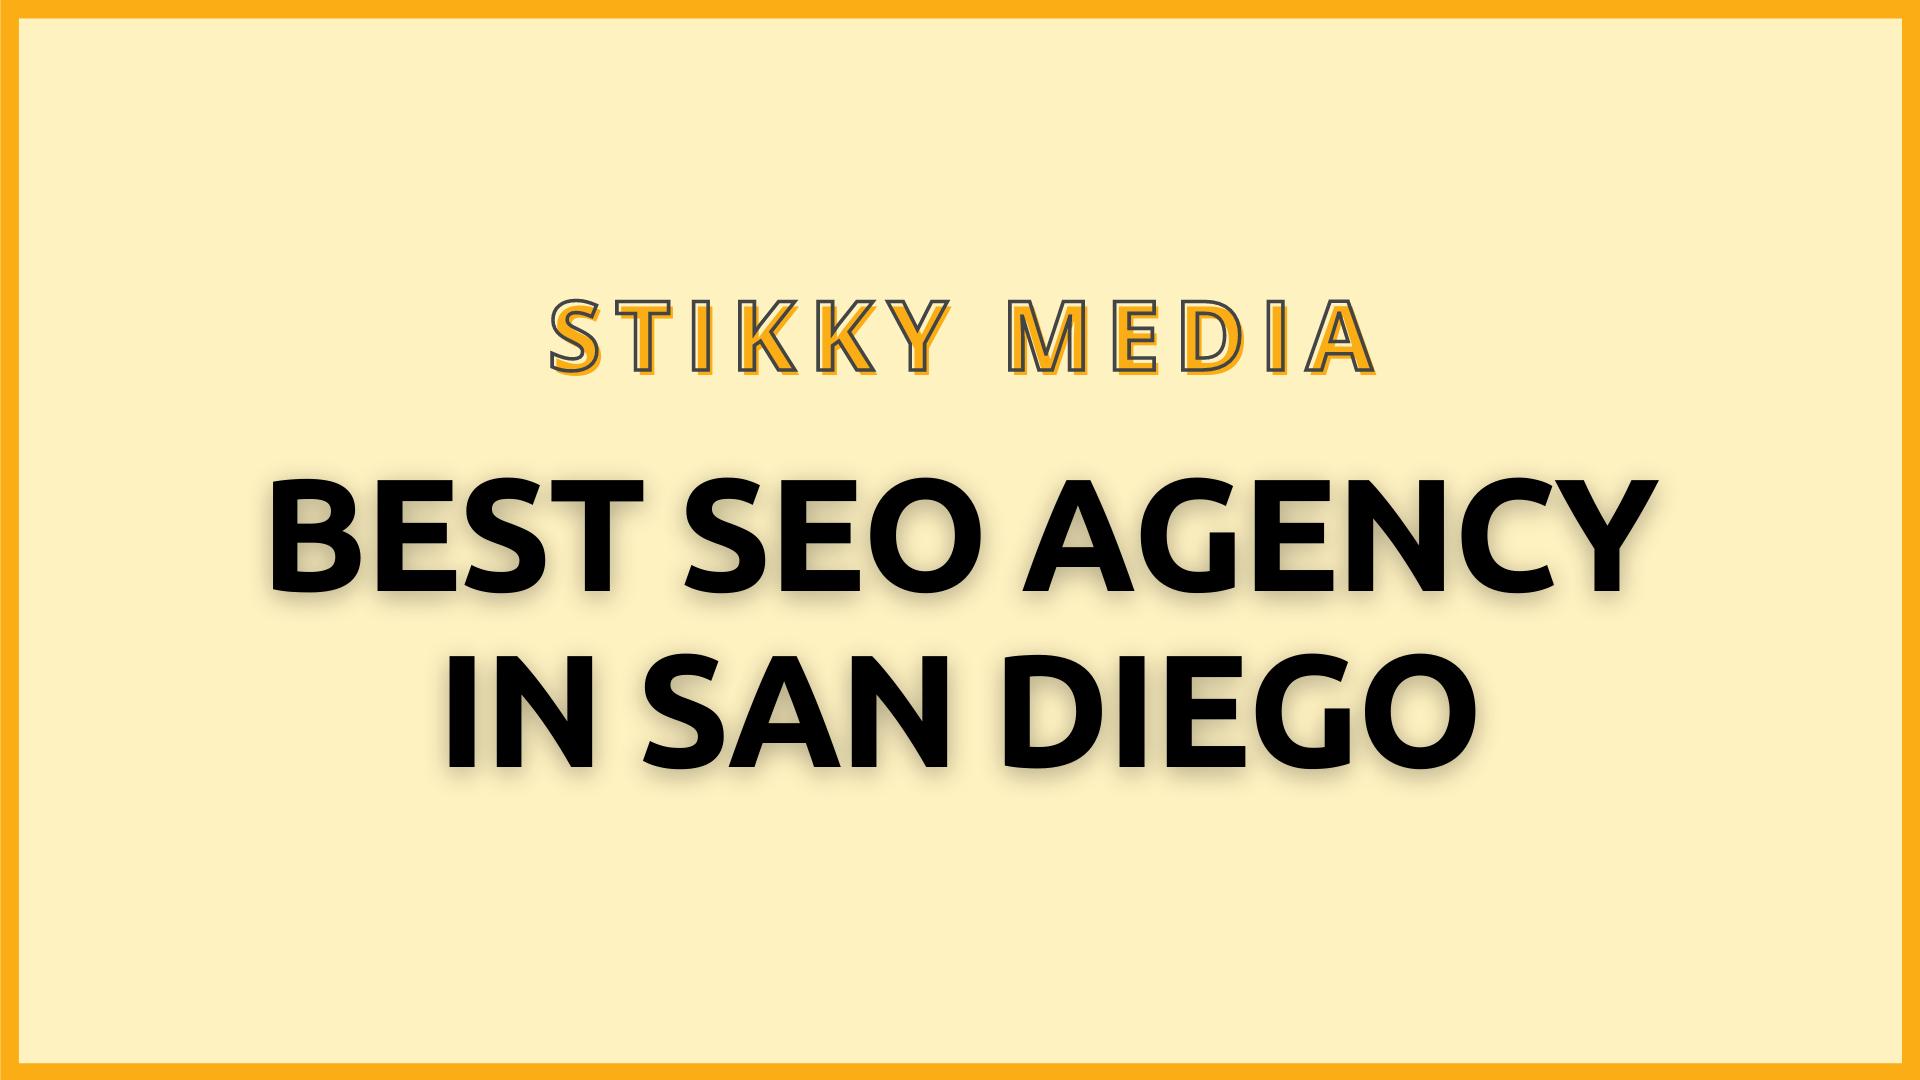 SEO services in San Diego - Stikky Media